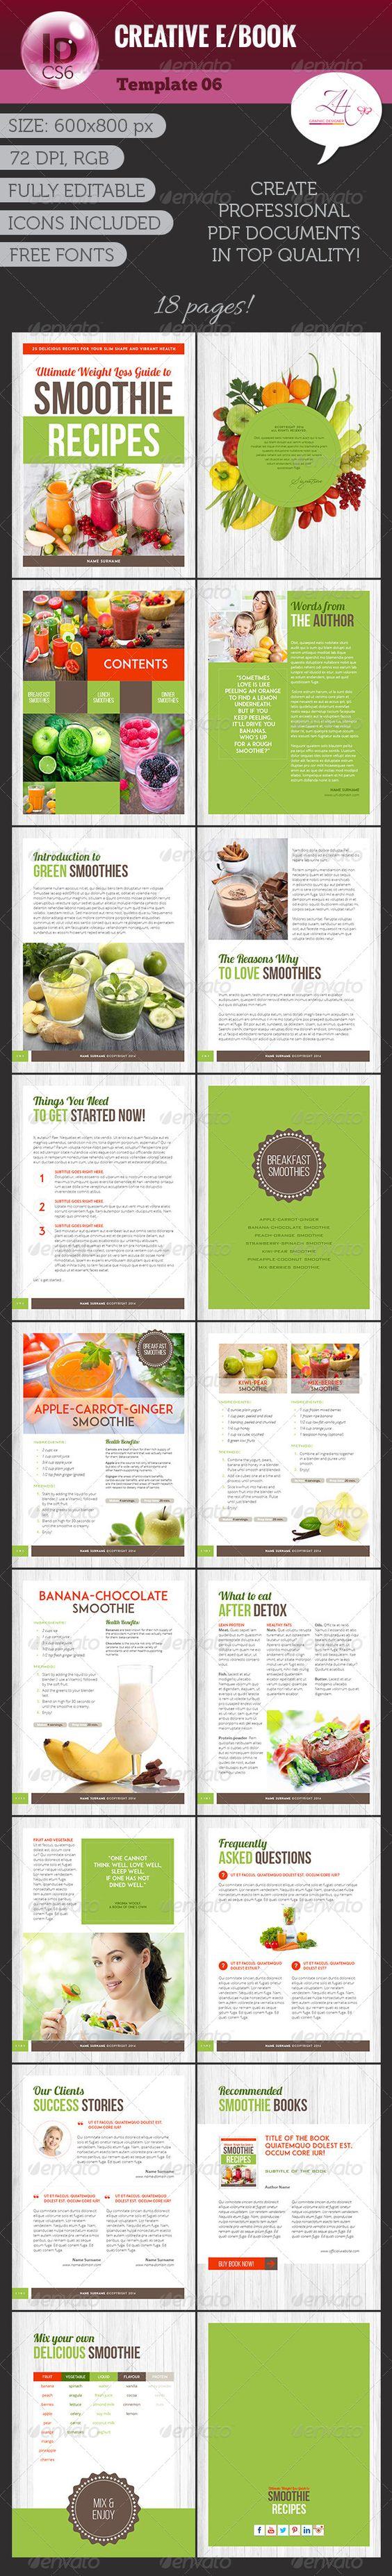 Generous Indesign Ebook Templates Images - Wordpress Themes Ideas ...